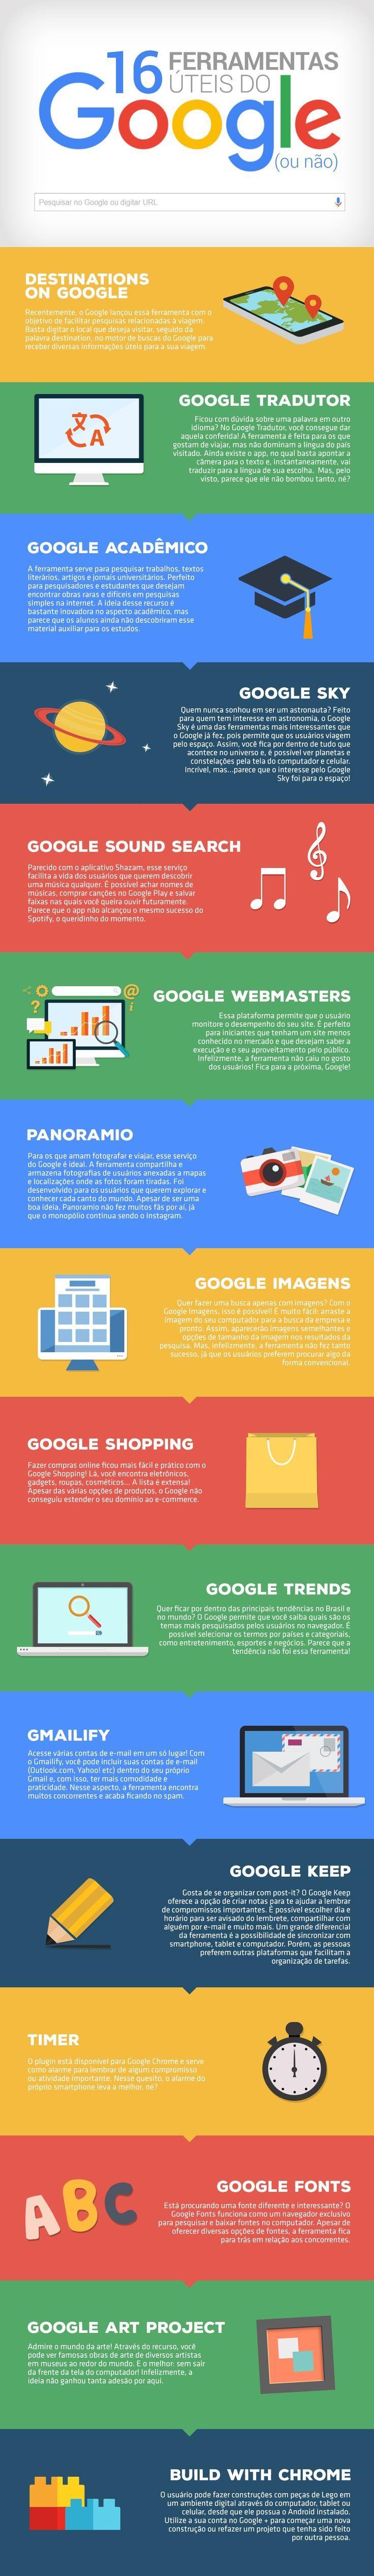 Manual Kit Sobrevivencia Do Google Ferramentas Uteis Camino Marketing Digital Consultoria Pemasaran Digital Marketing Internet